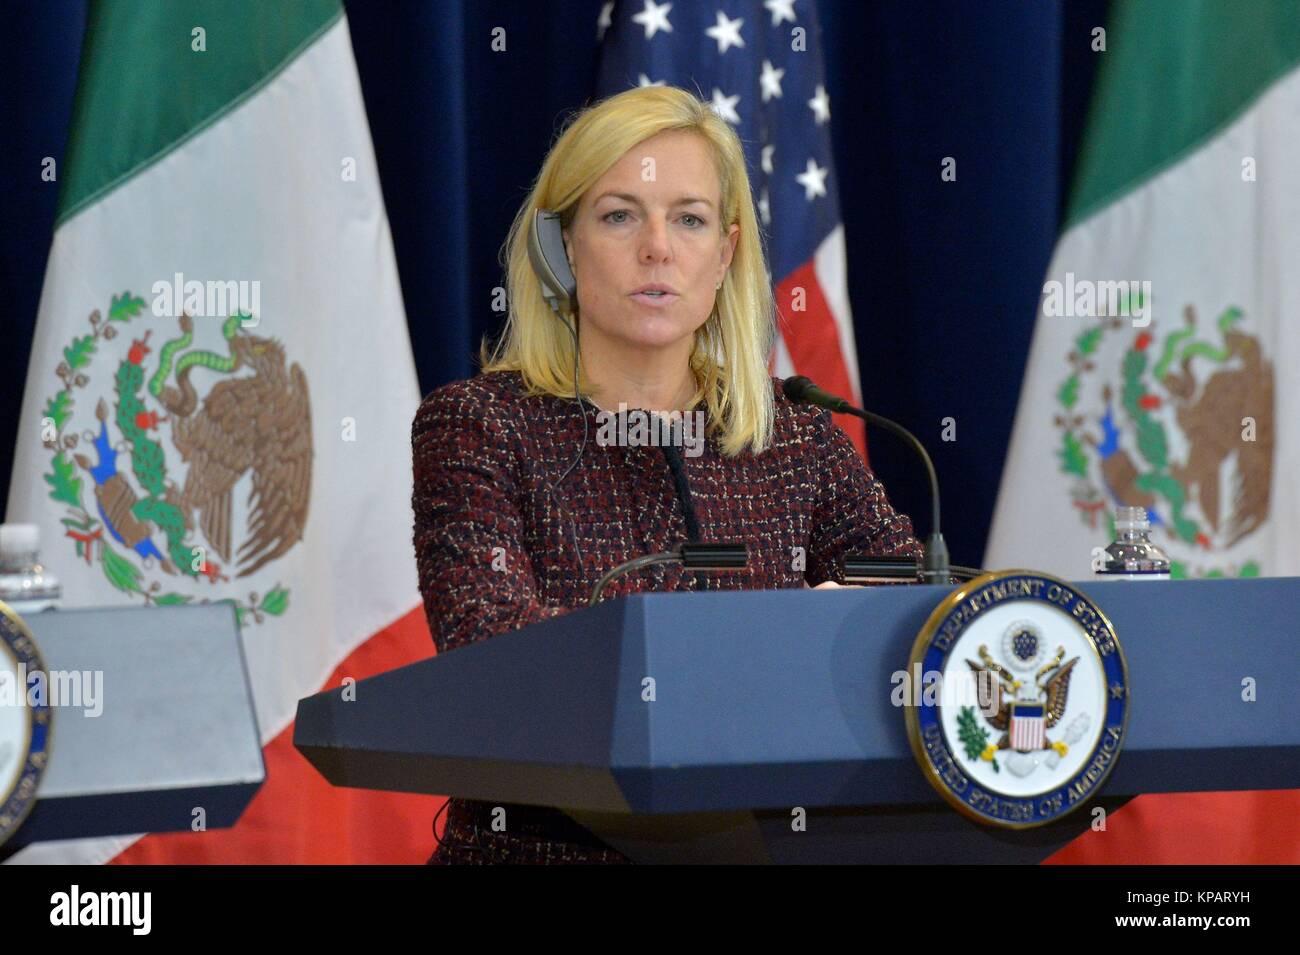 Washington DC, USA. 14th Dec, 2017. U.S. Homeland Security Secretary Kirstjen Nielsen delivers remarks at the Second - Stock Image